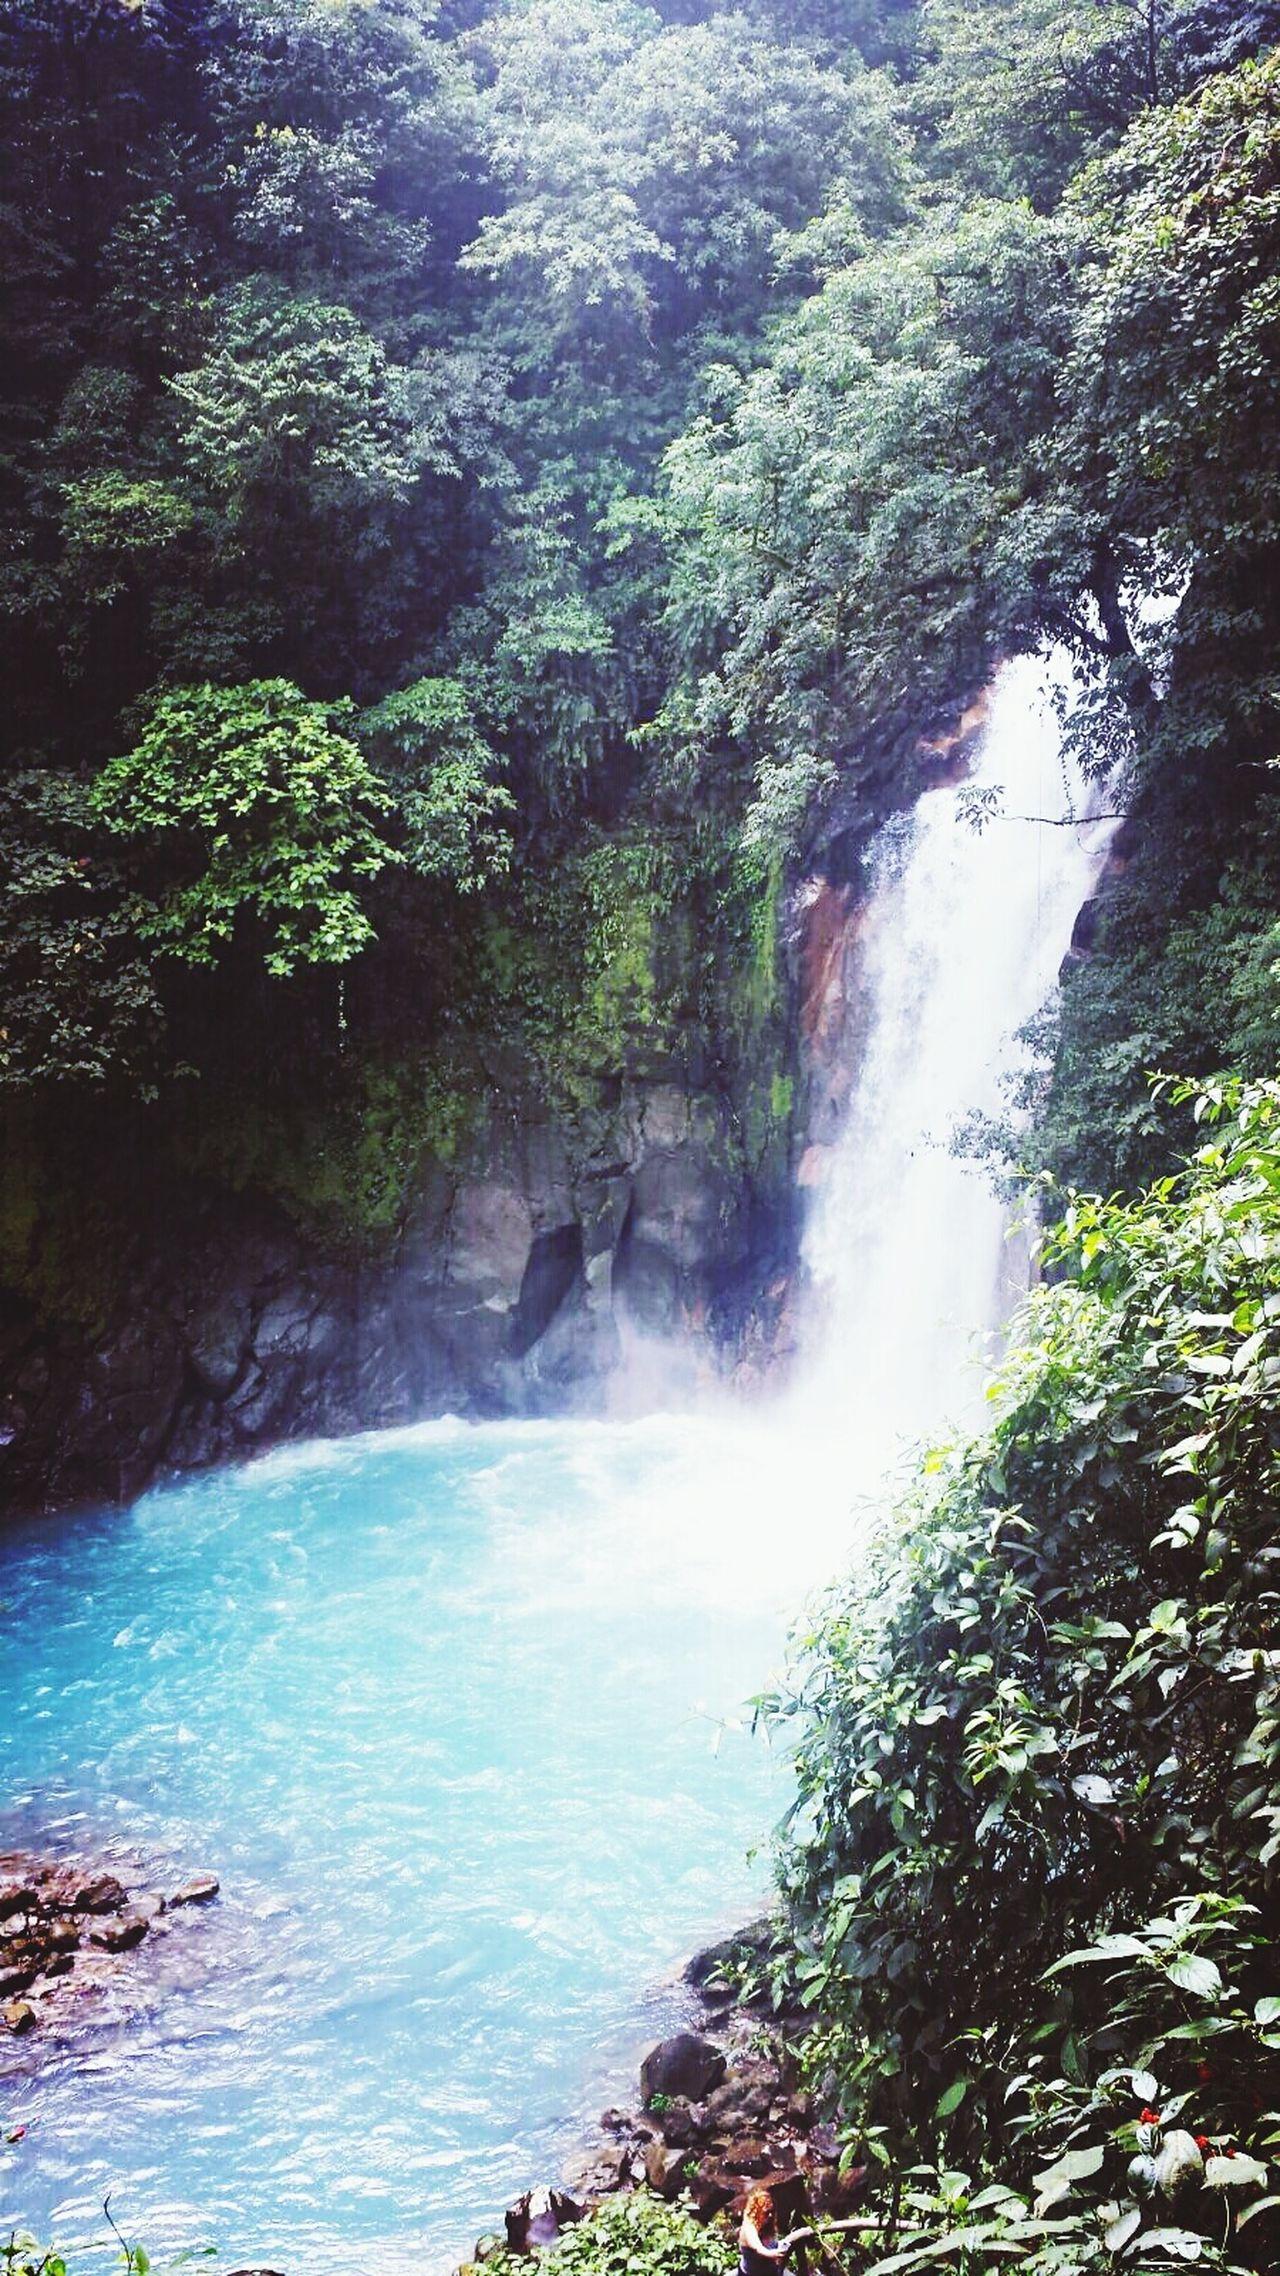 Water Waterfall Beauty In Nature Eco Tourism Costarica2016 Pura Vida ✌ Parque Nacional Volcan Tenorio Azul